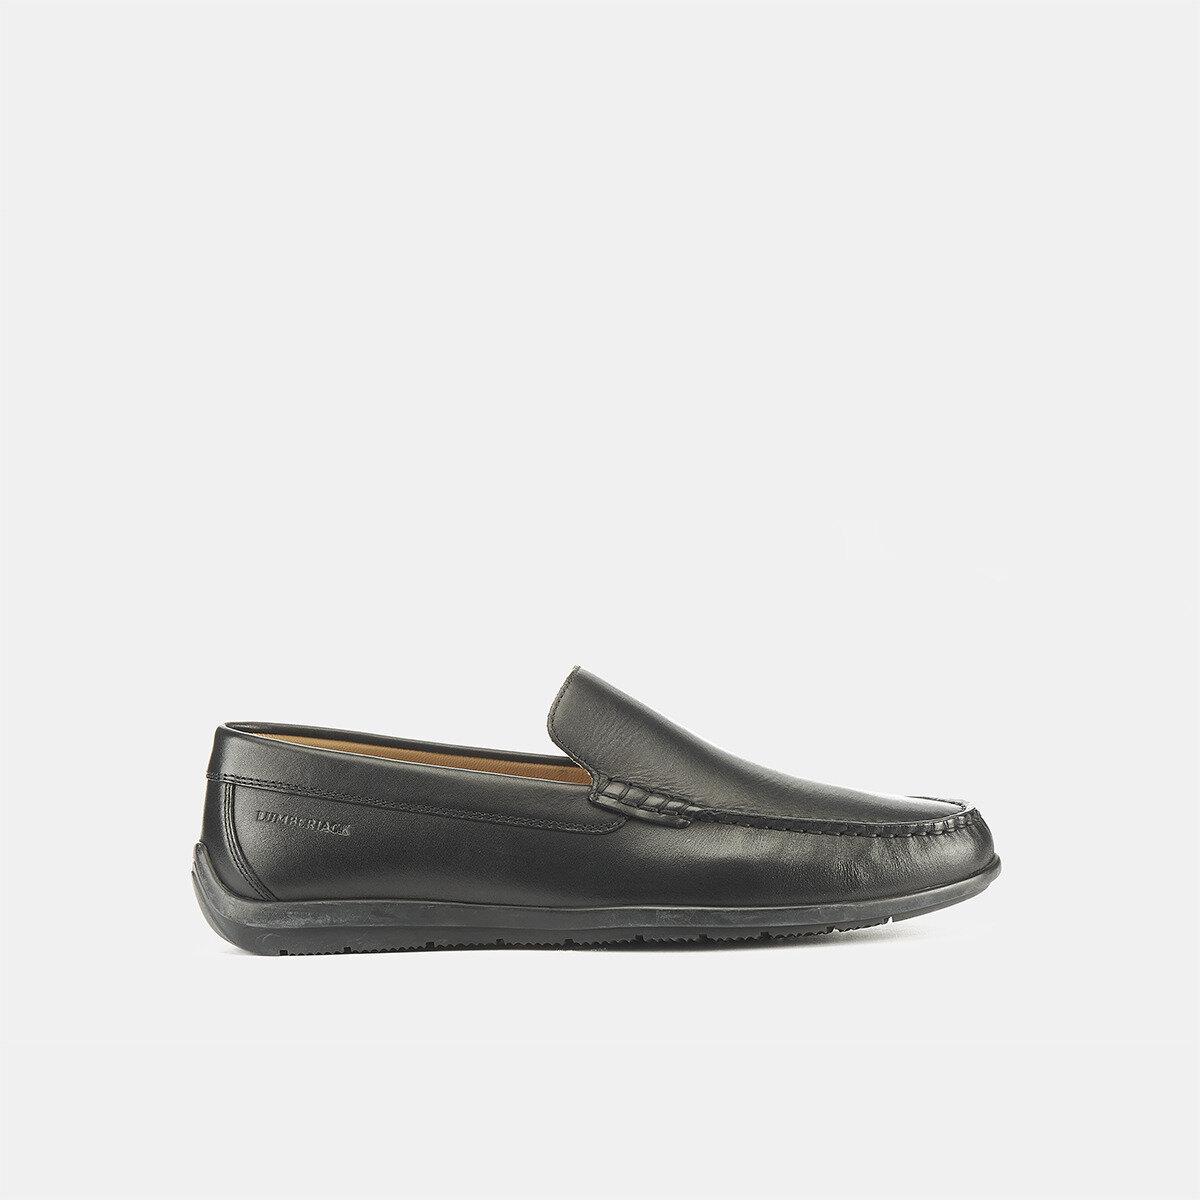 LEMAN BLACK Man Loafers